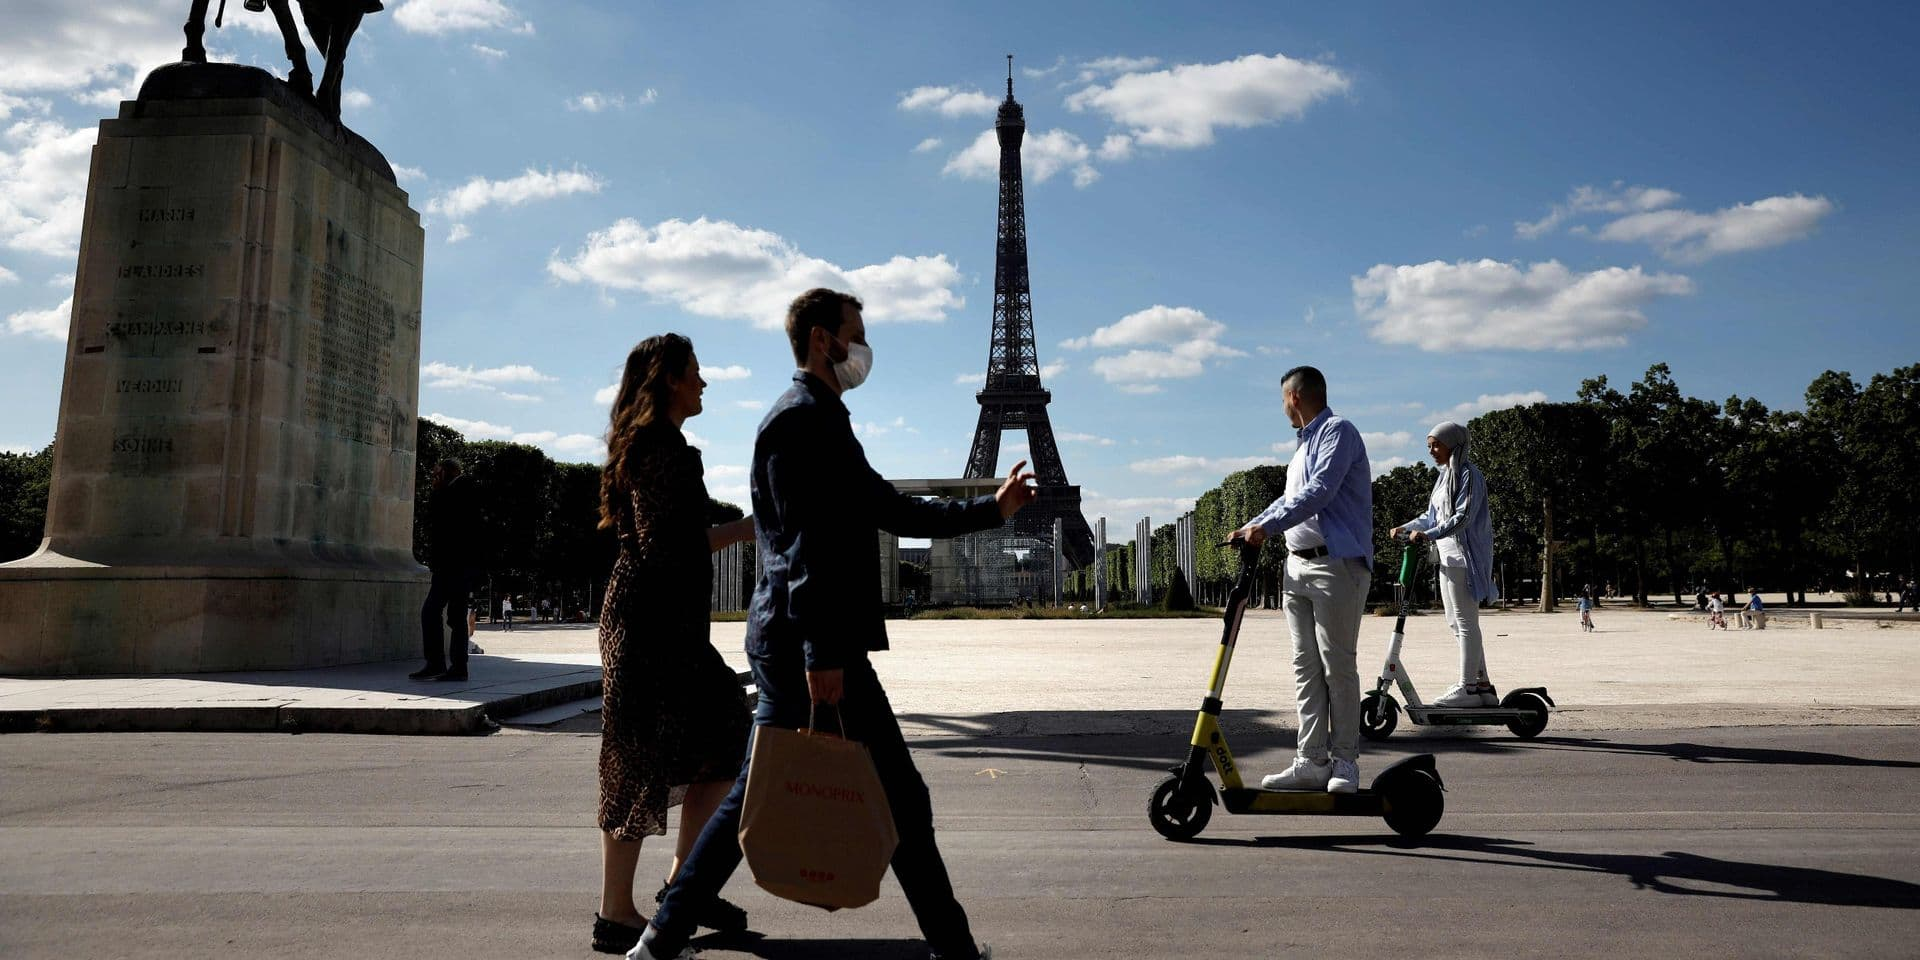 Coronavirus: la France revoit son bilan à la baisse